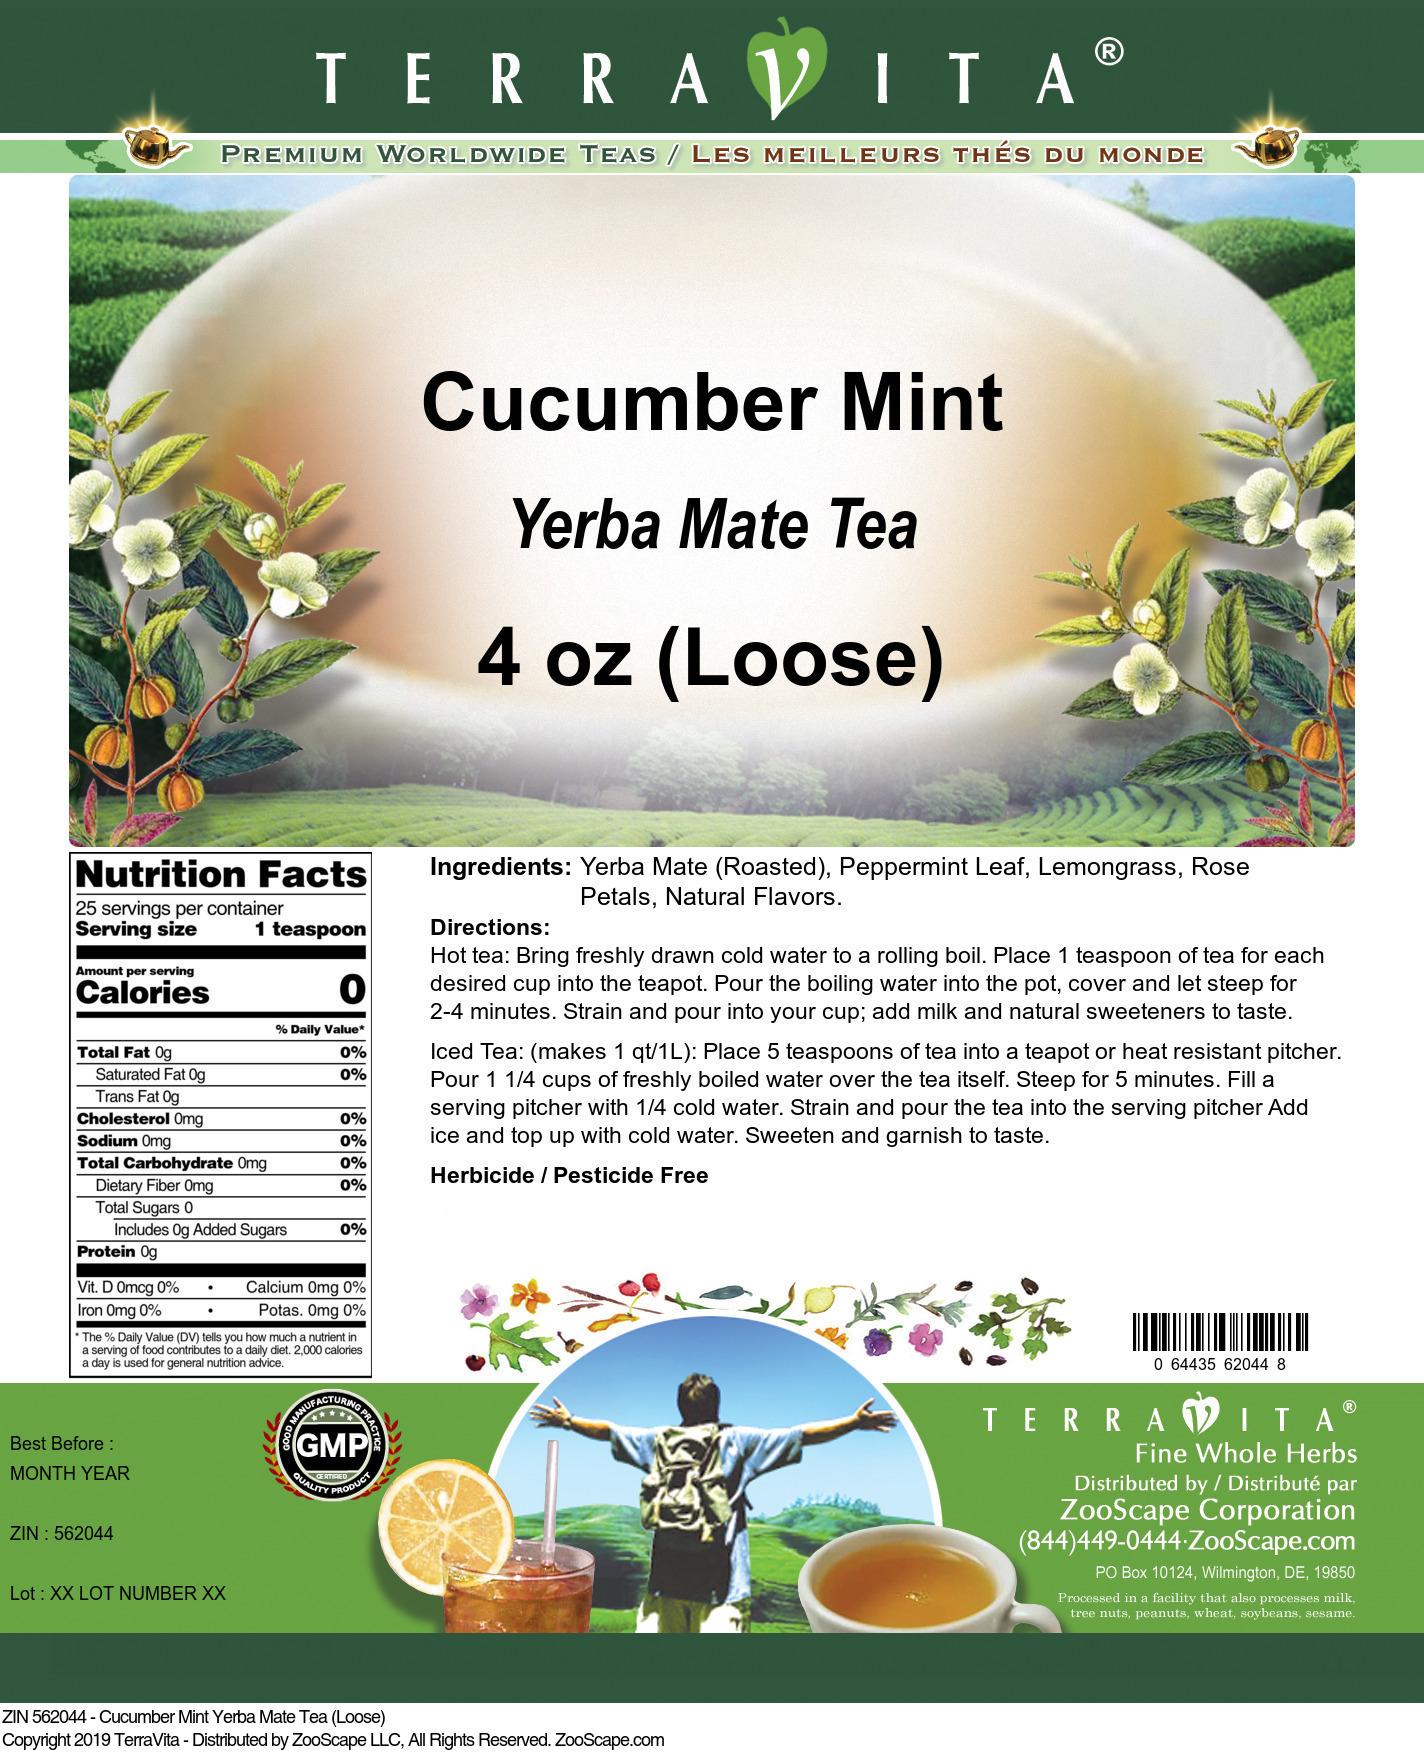 Cucumber Mint Yerba Mate